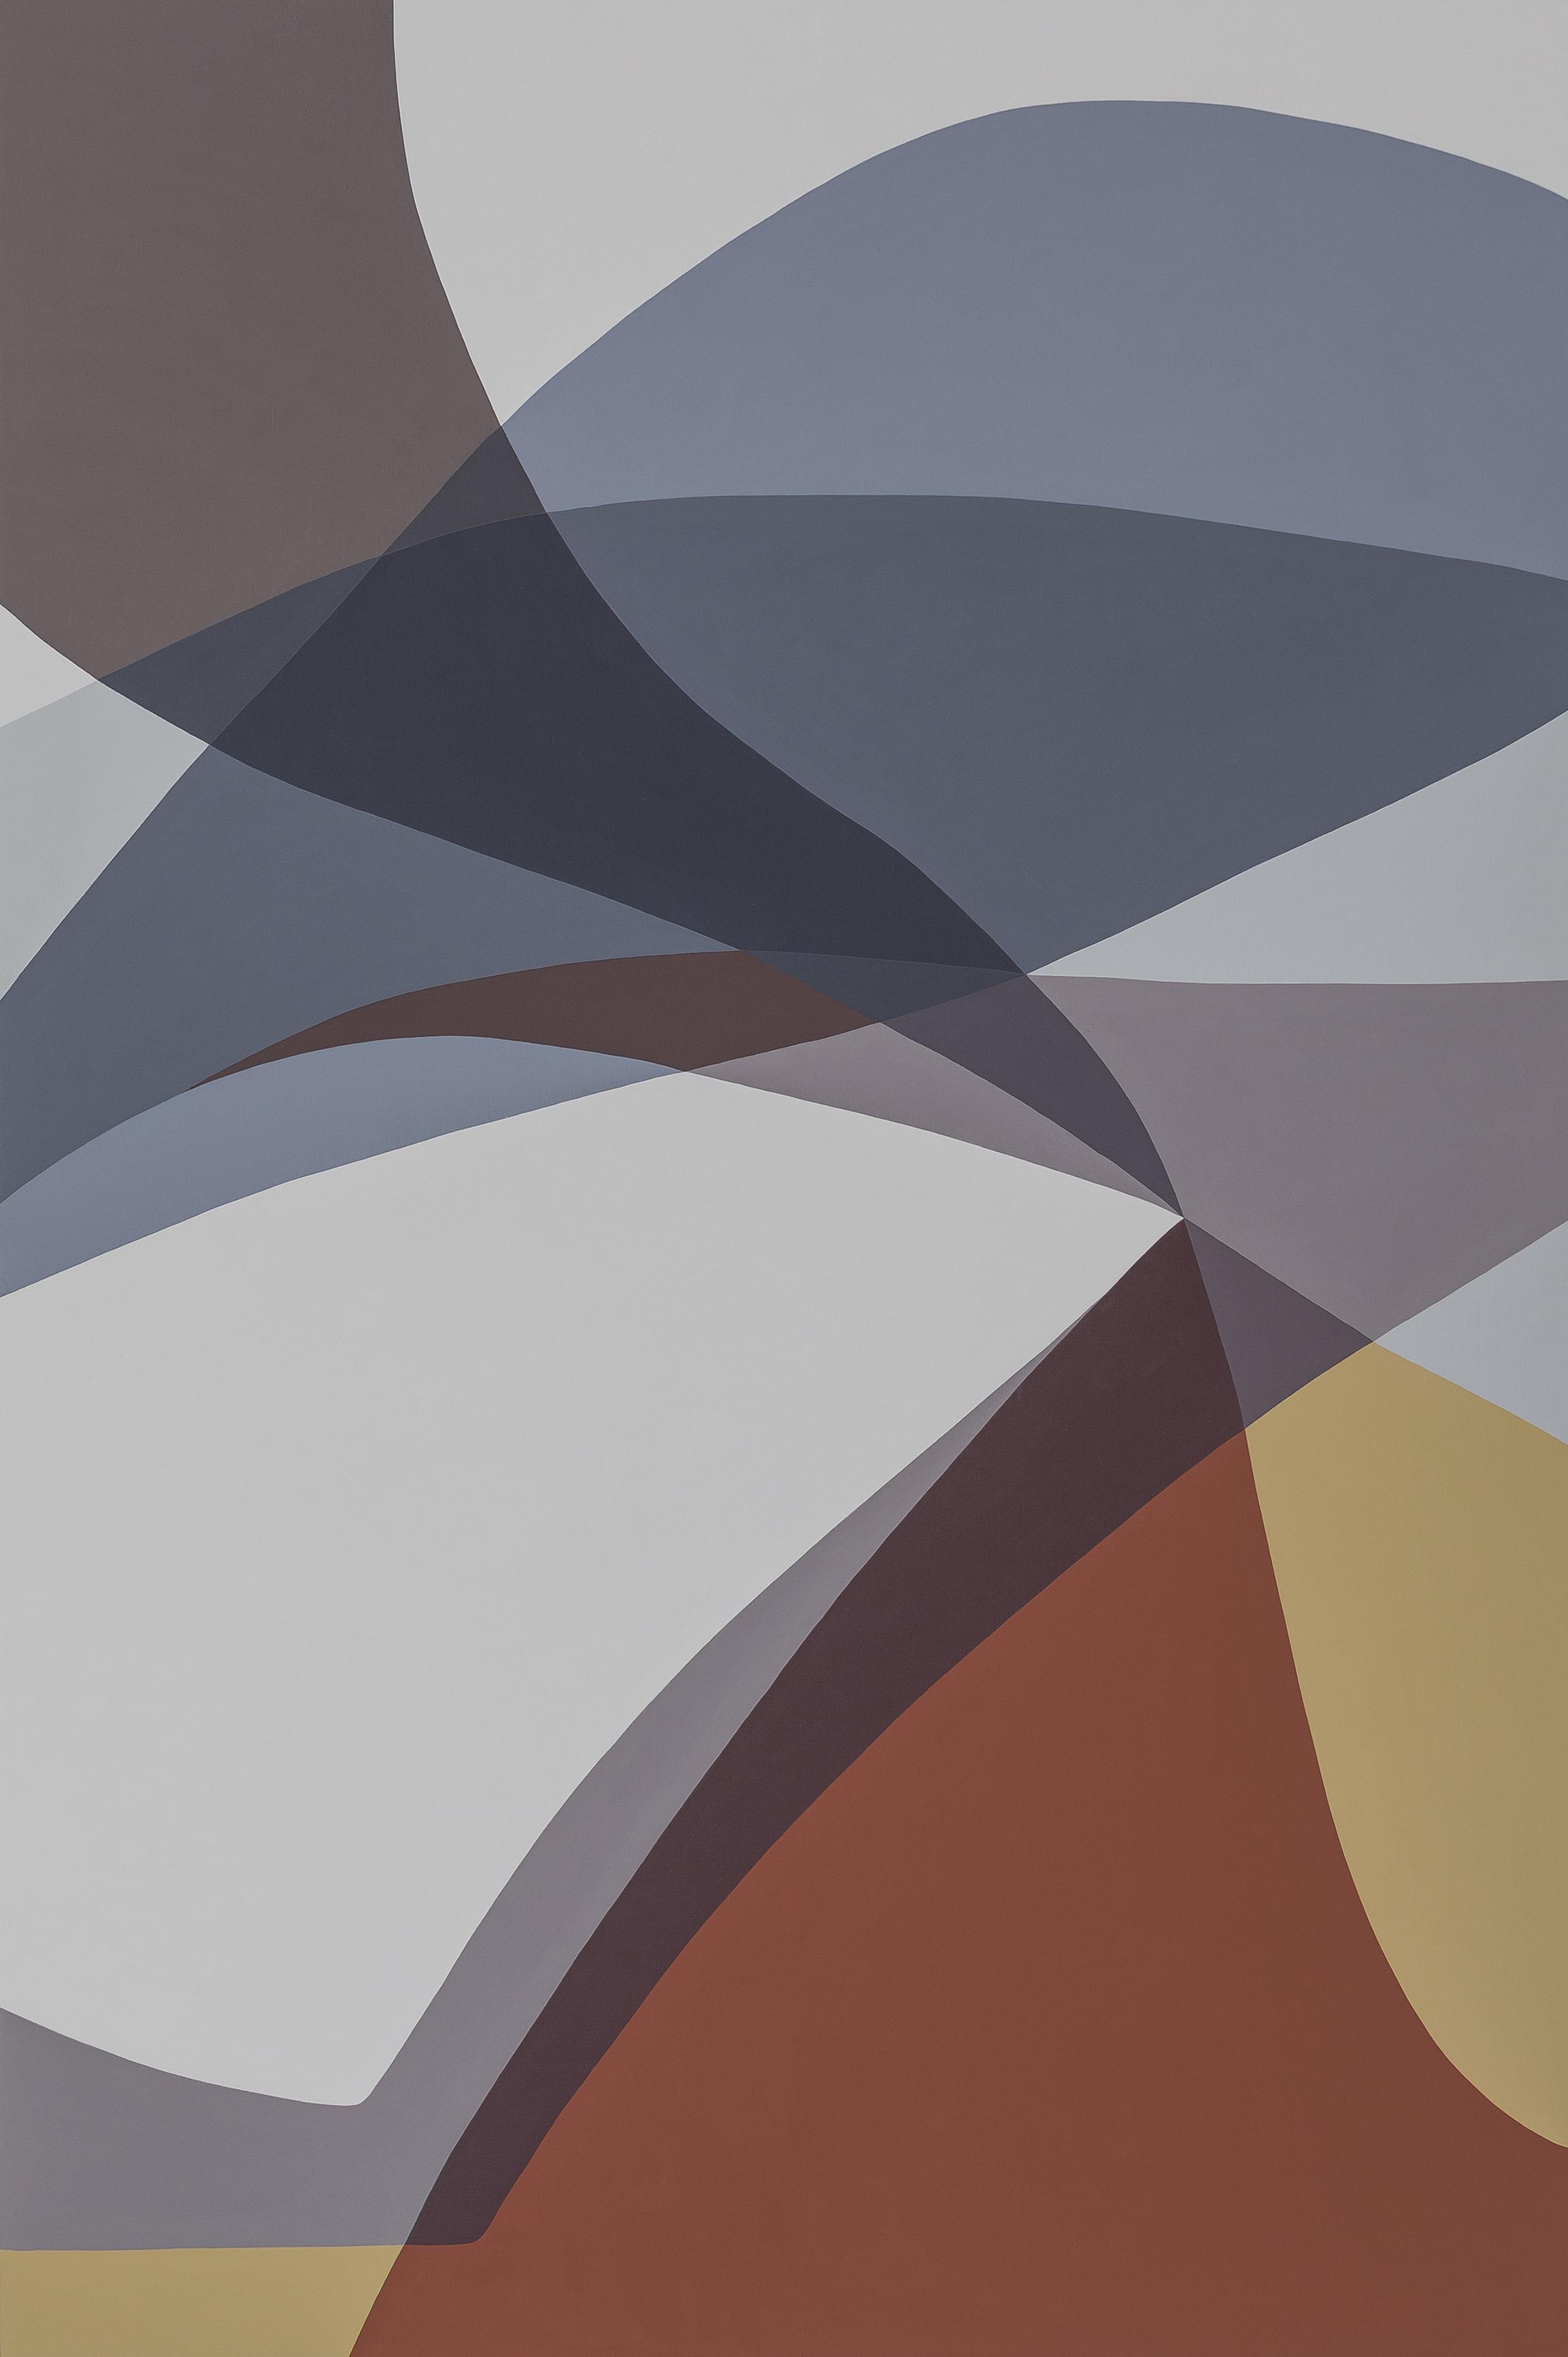 Jennifer Goodman, Autumnal Ages, 150x100cm